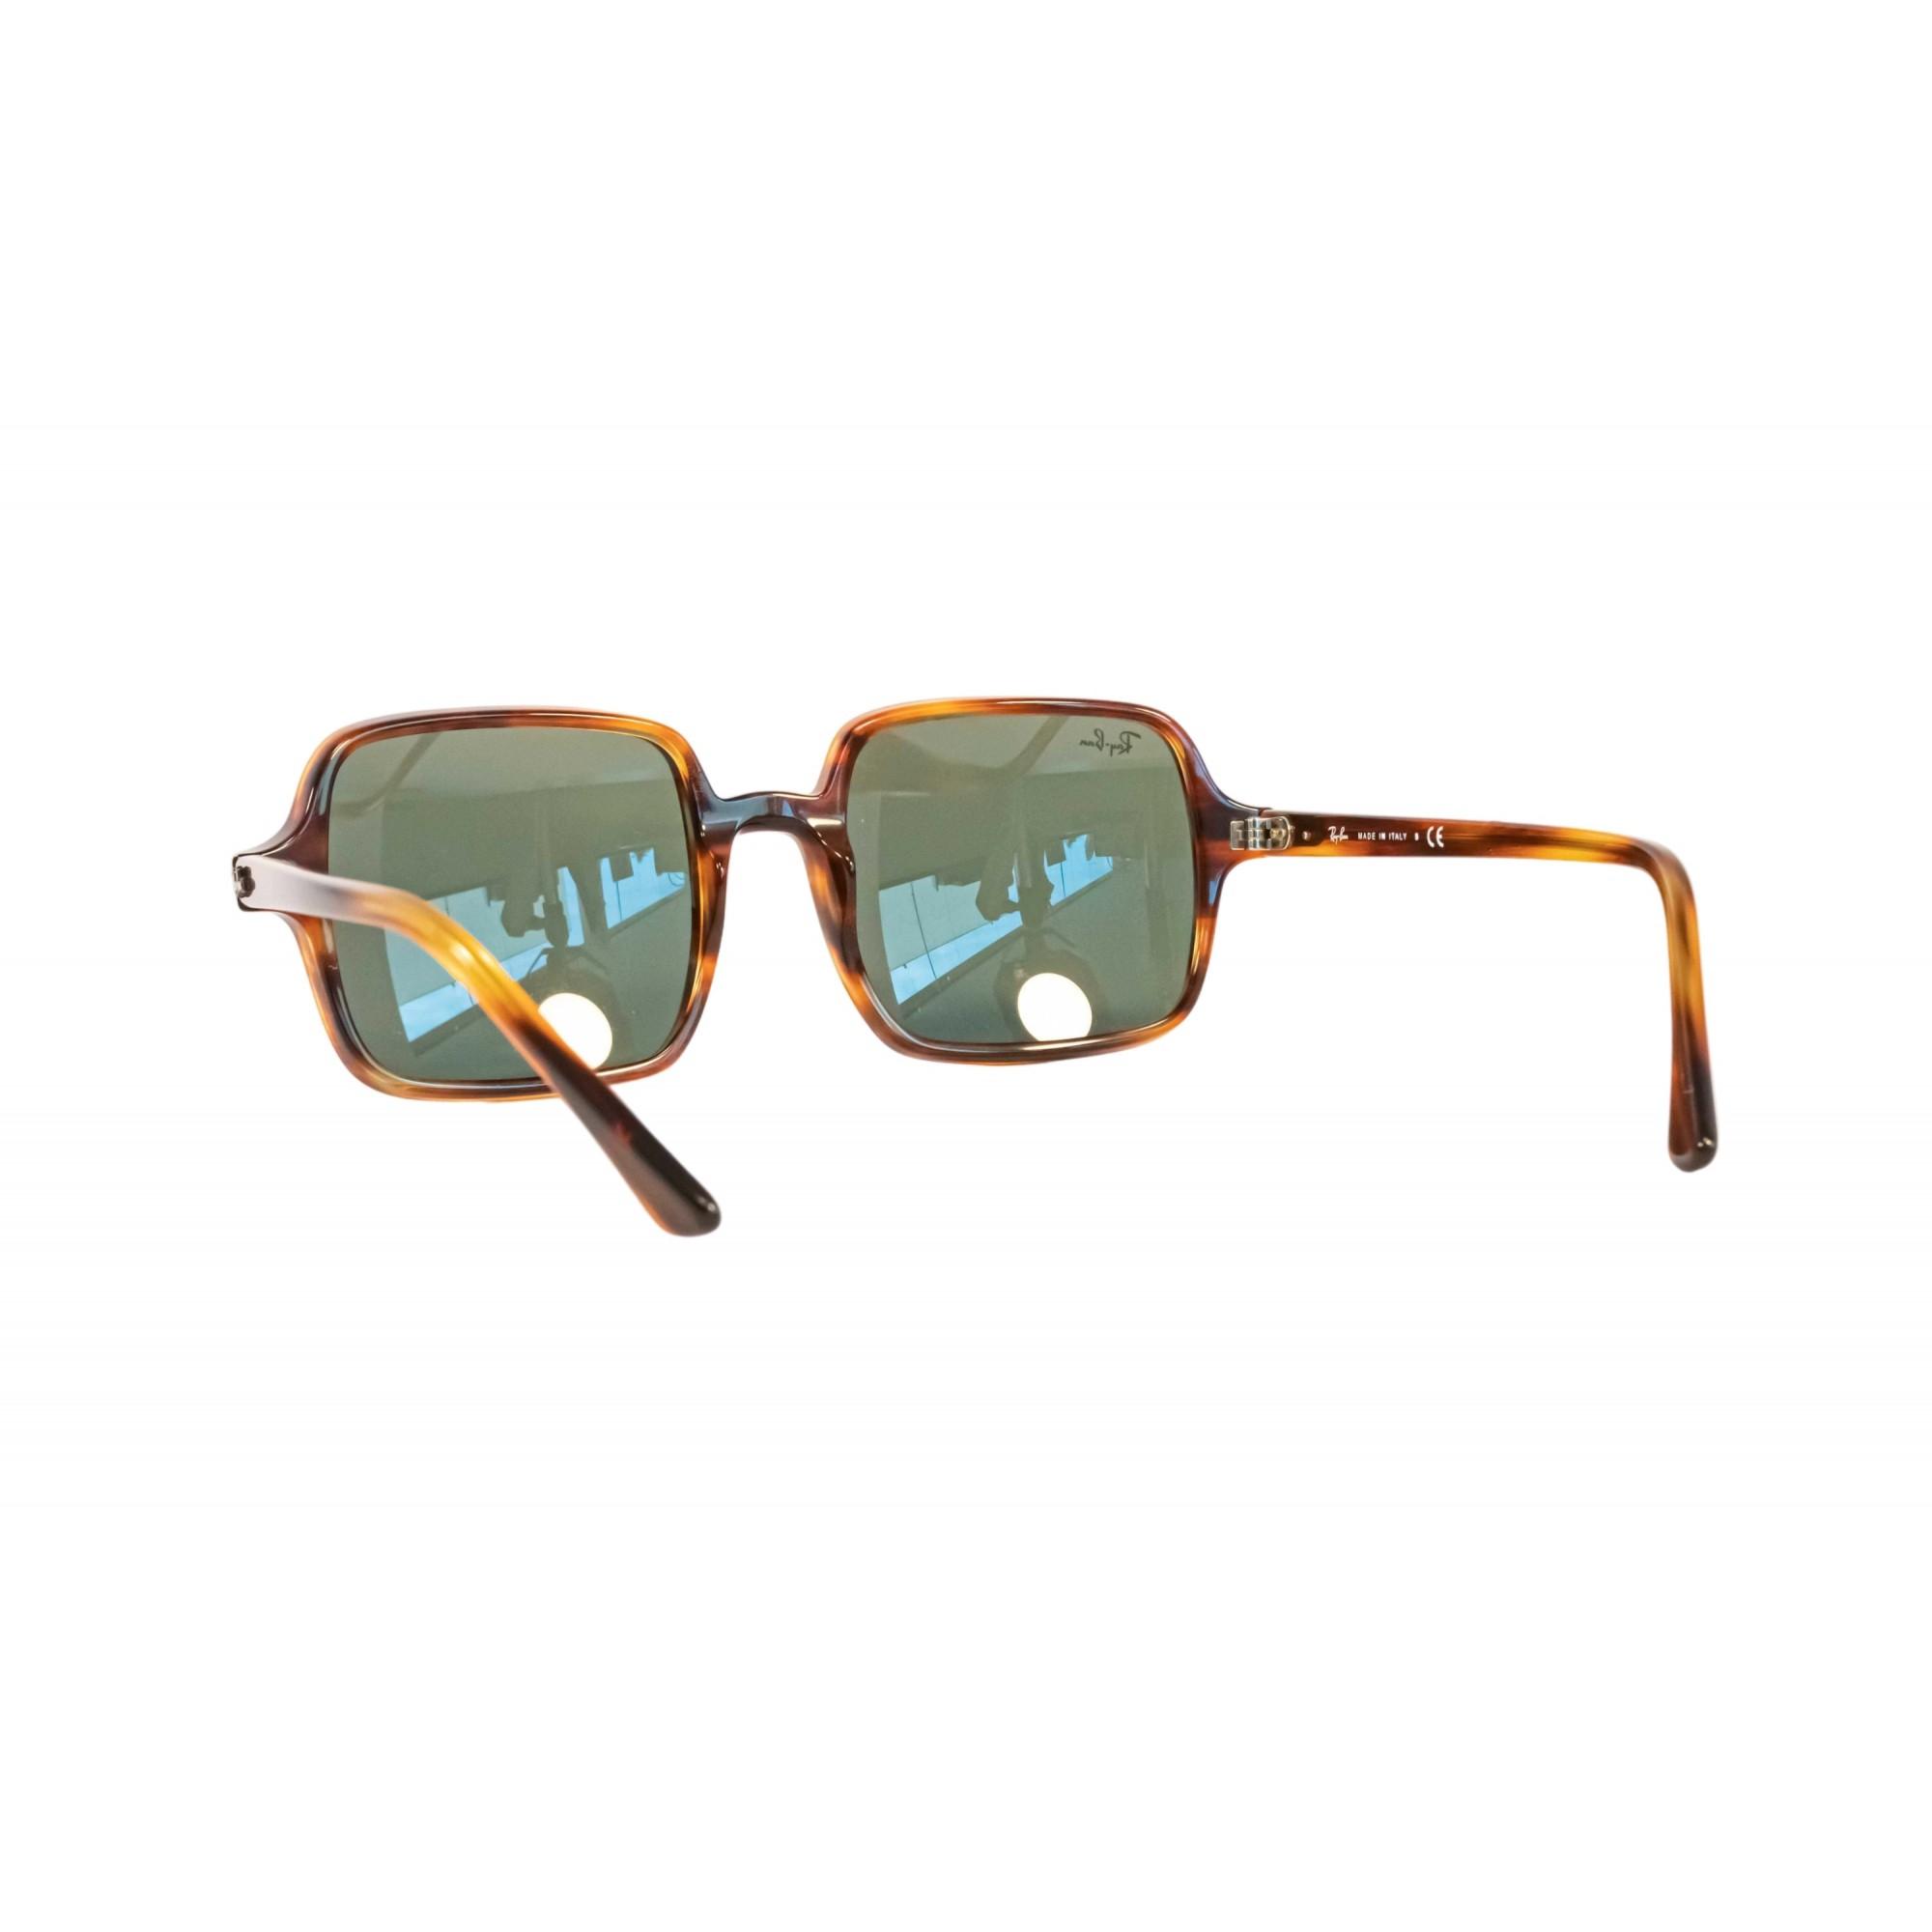 Óculos Ray Ban Quadrado Rb1973  95431 53 Tartaruga